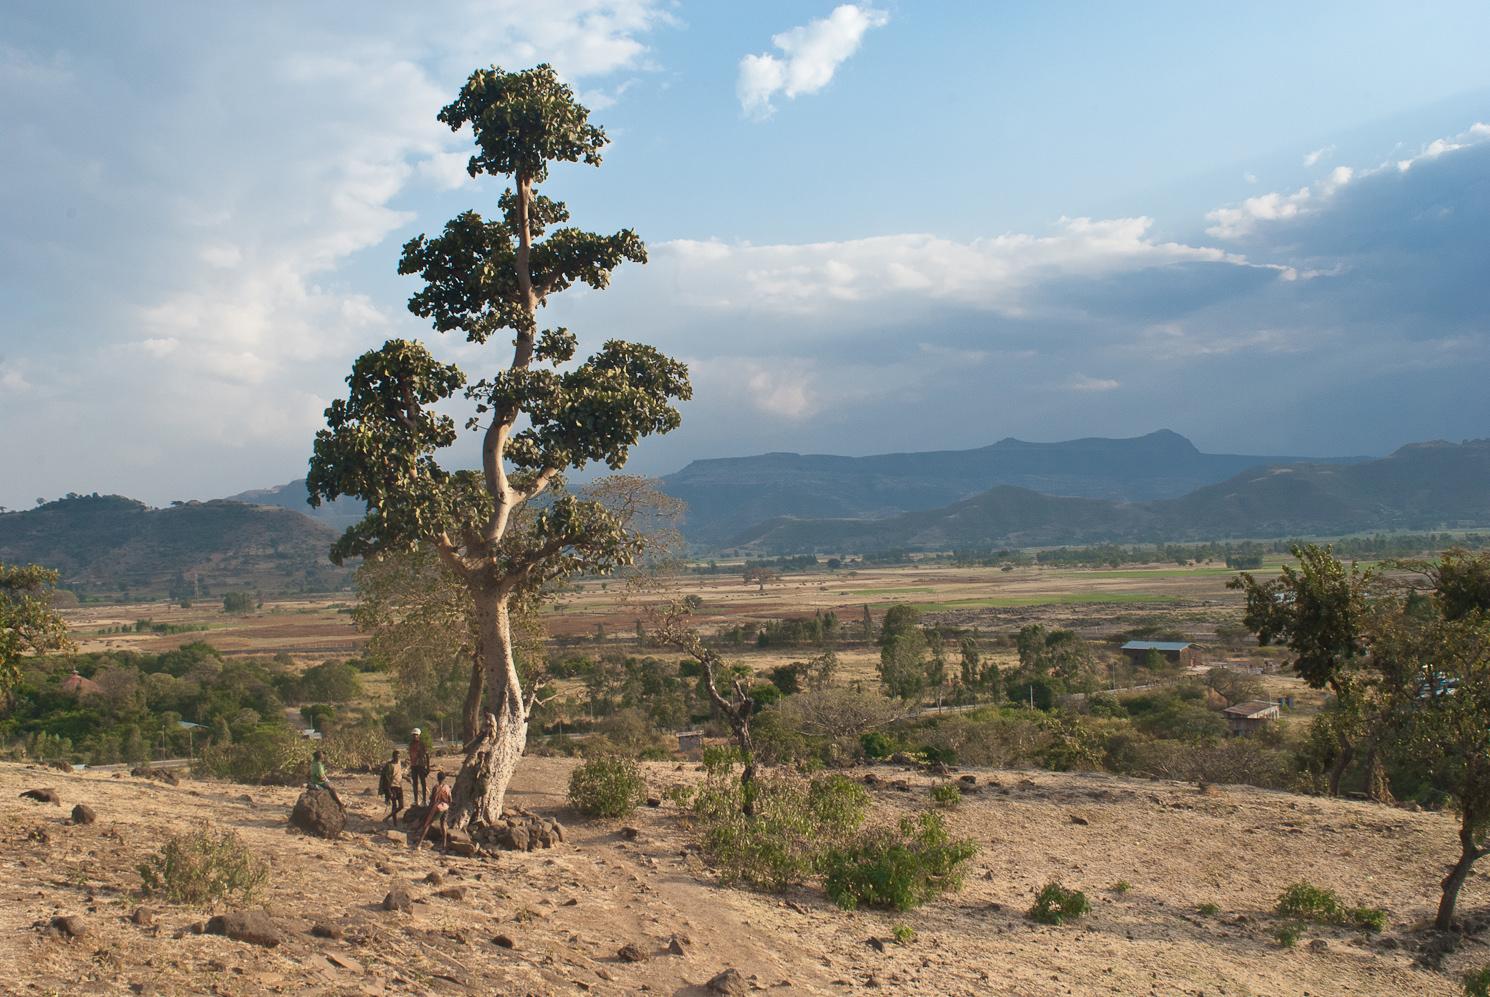 Ethiopia, Dancalia: a Walking Land